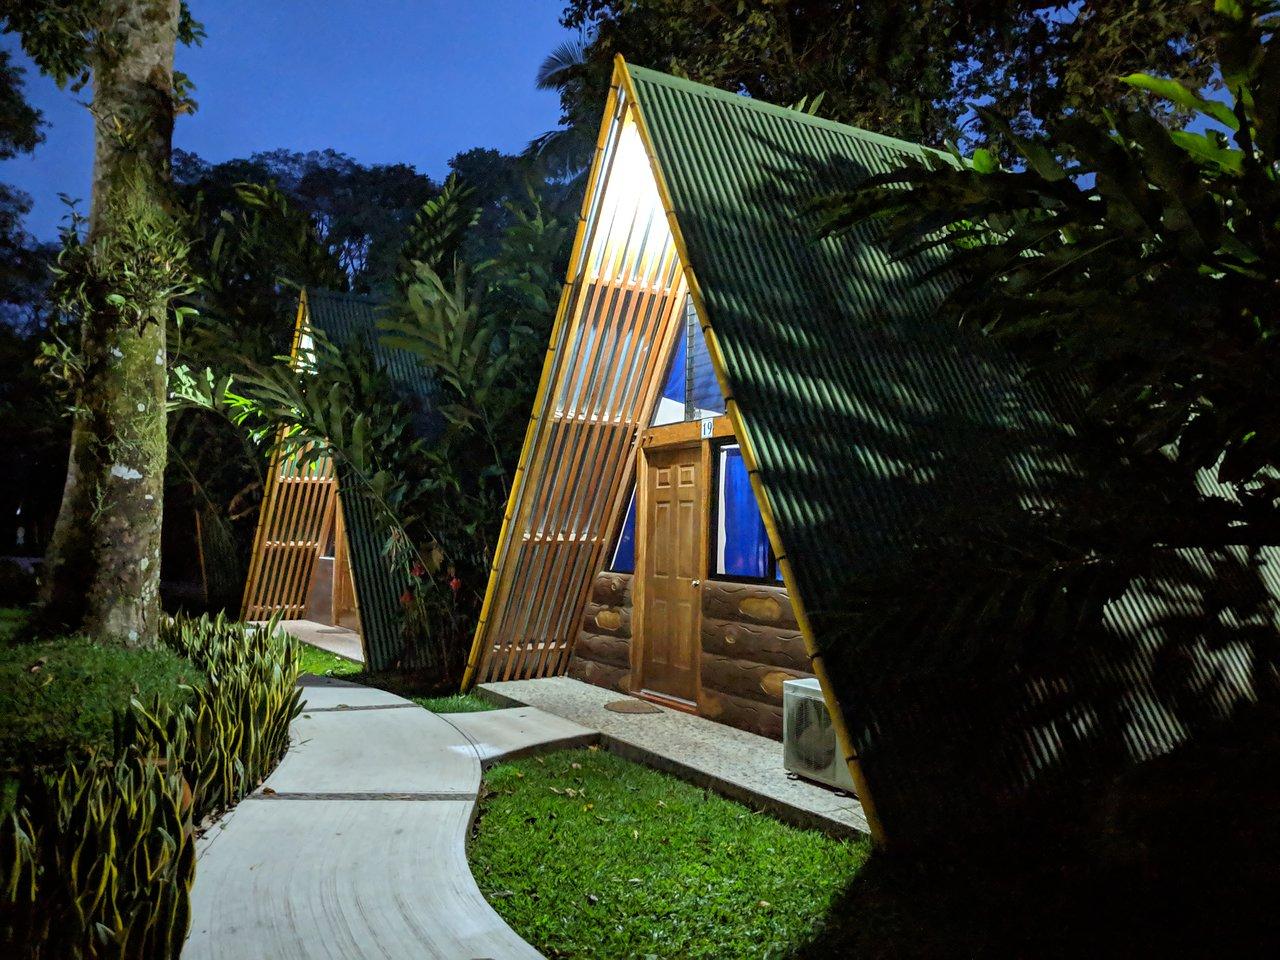 Hotel Y Bungalows El Jardin - Prices & Campground Reviews ... tout Bungalow De Jardin Design